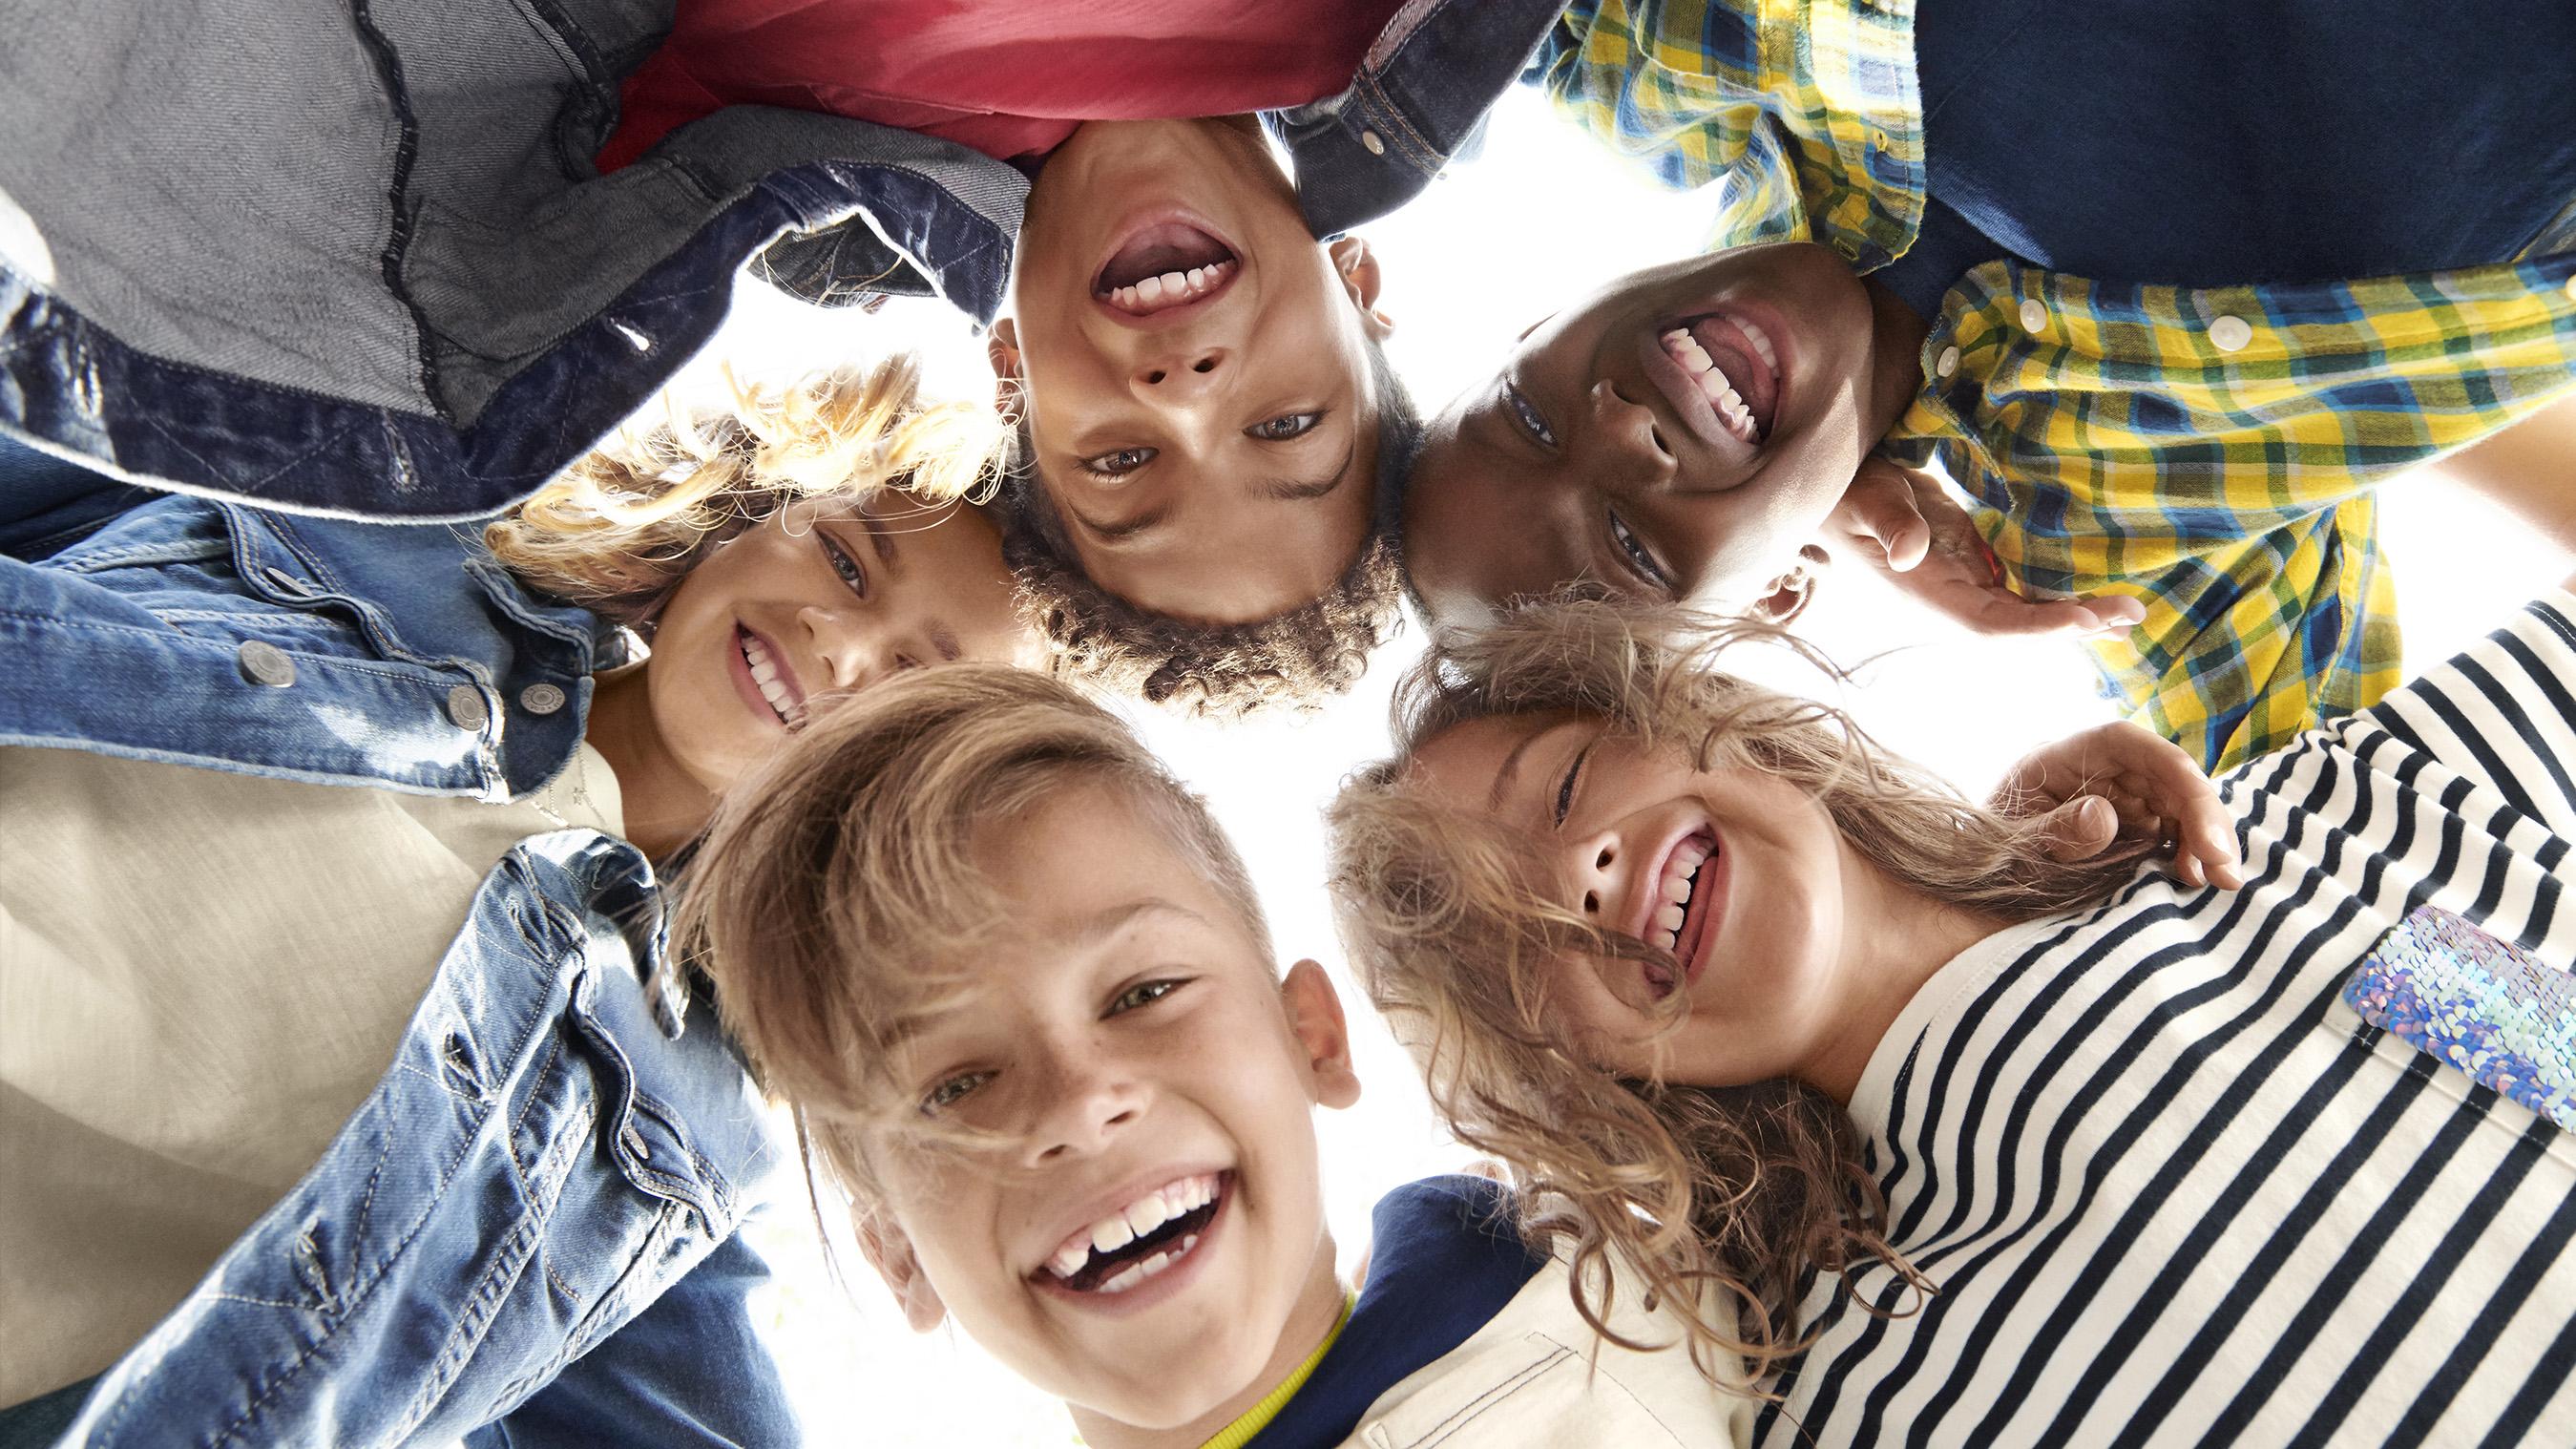 Let kids go! Let them show us their way FORWARD. #GapToSchool